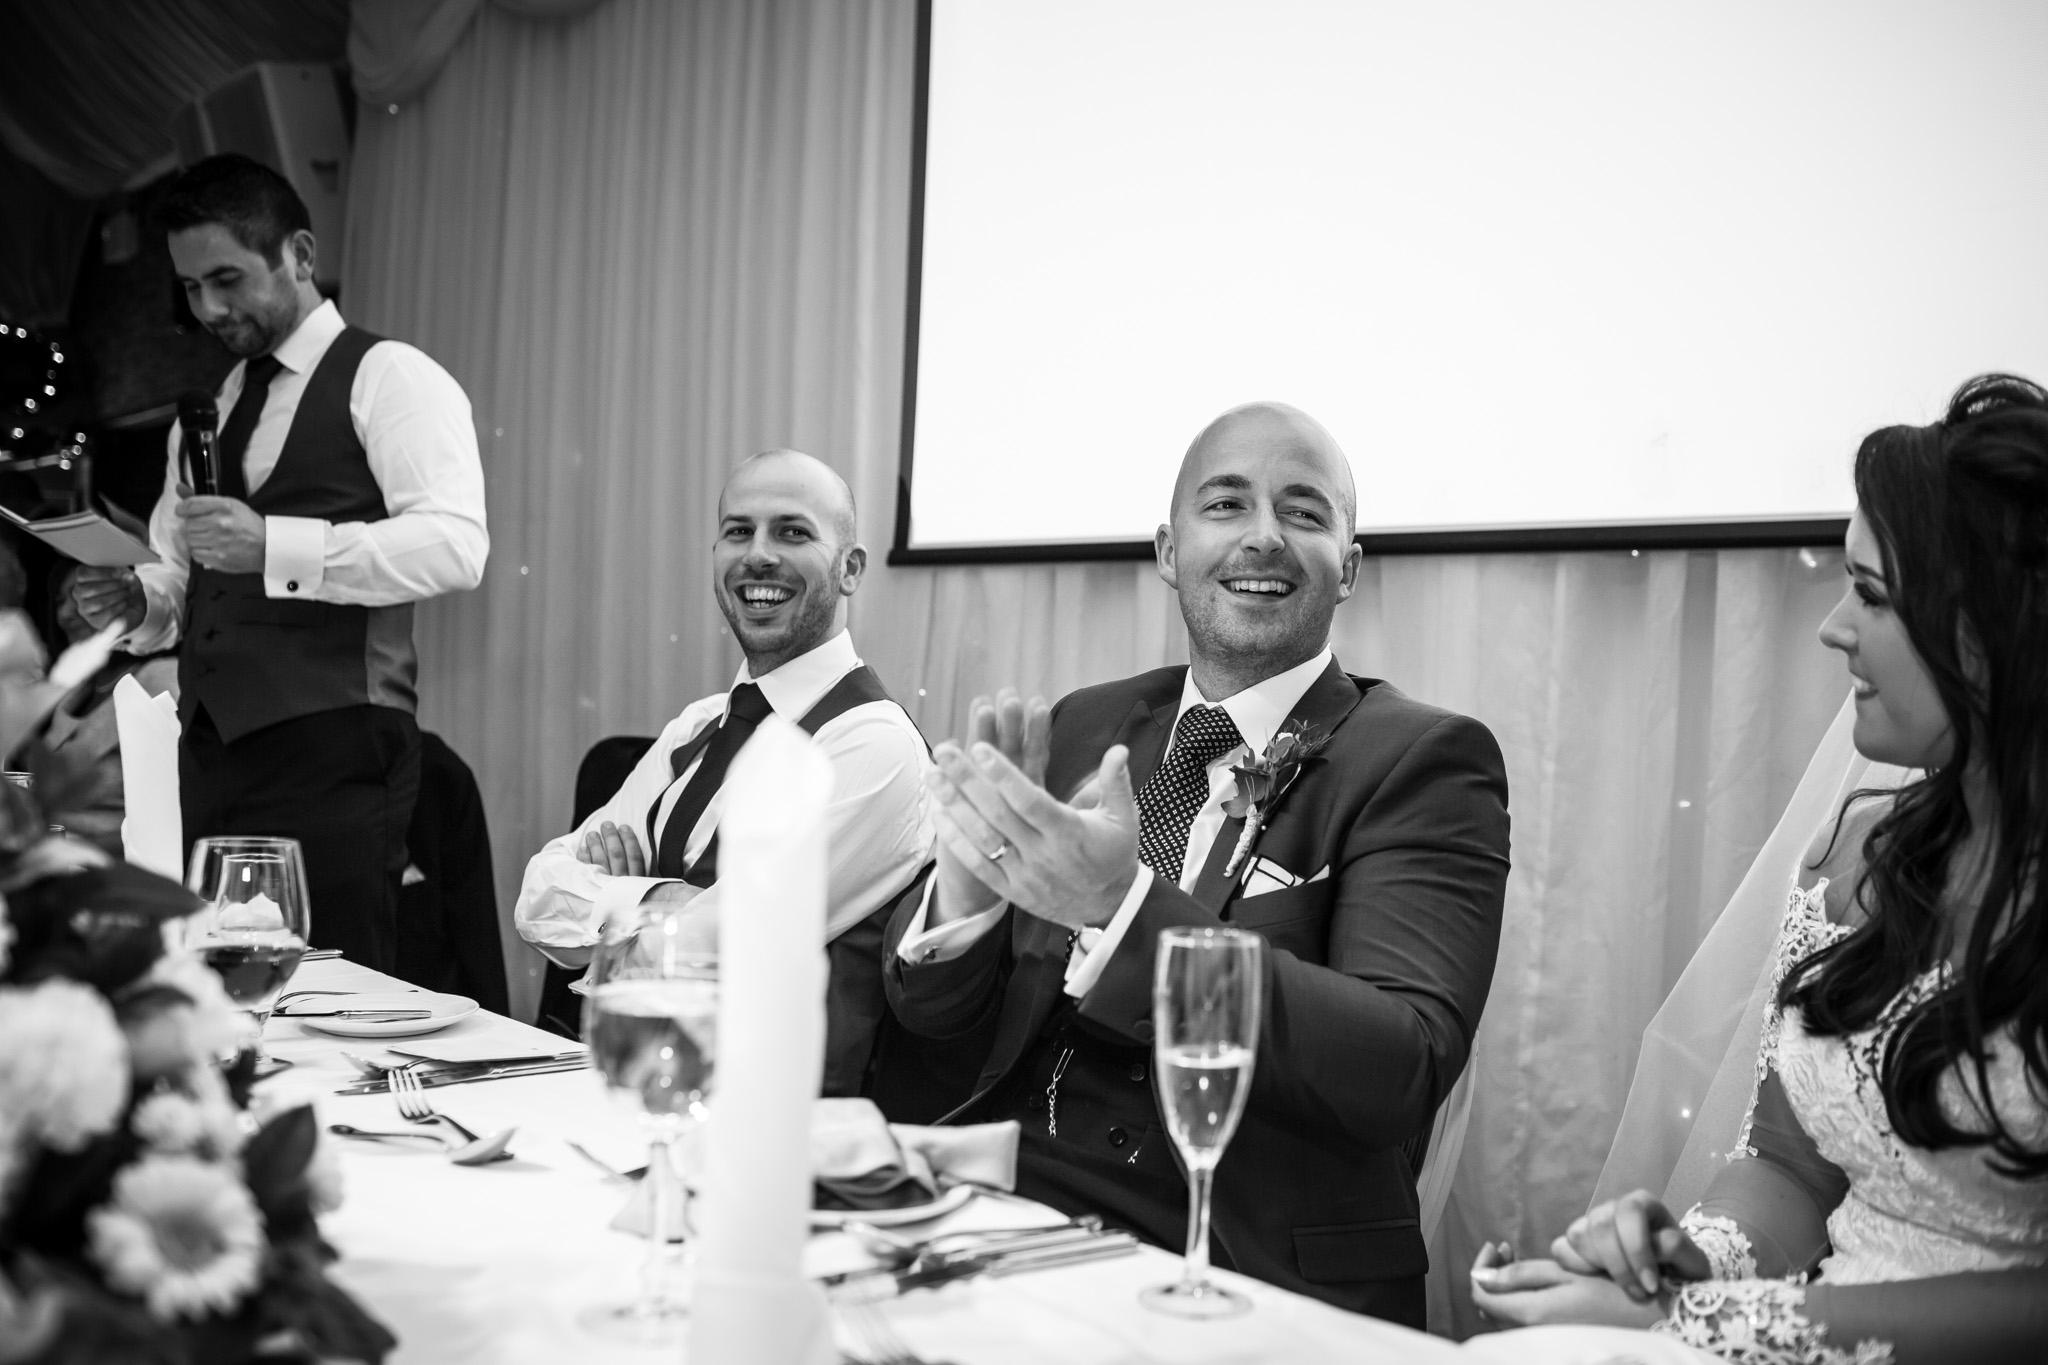 Mark_Barnes_Northern_Ireland_wedding_photographer_Harveys_Point_Donegall_Wedding_photography-Adam&Gemma-53.jpg